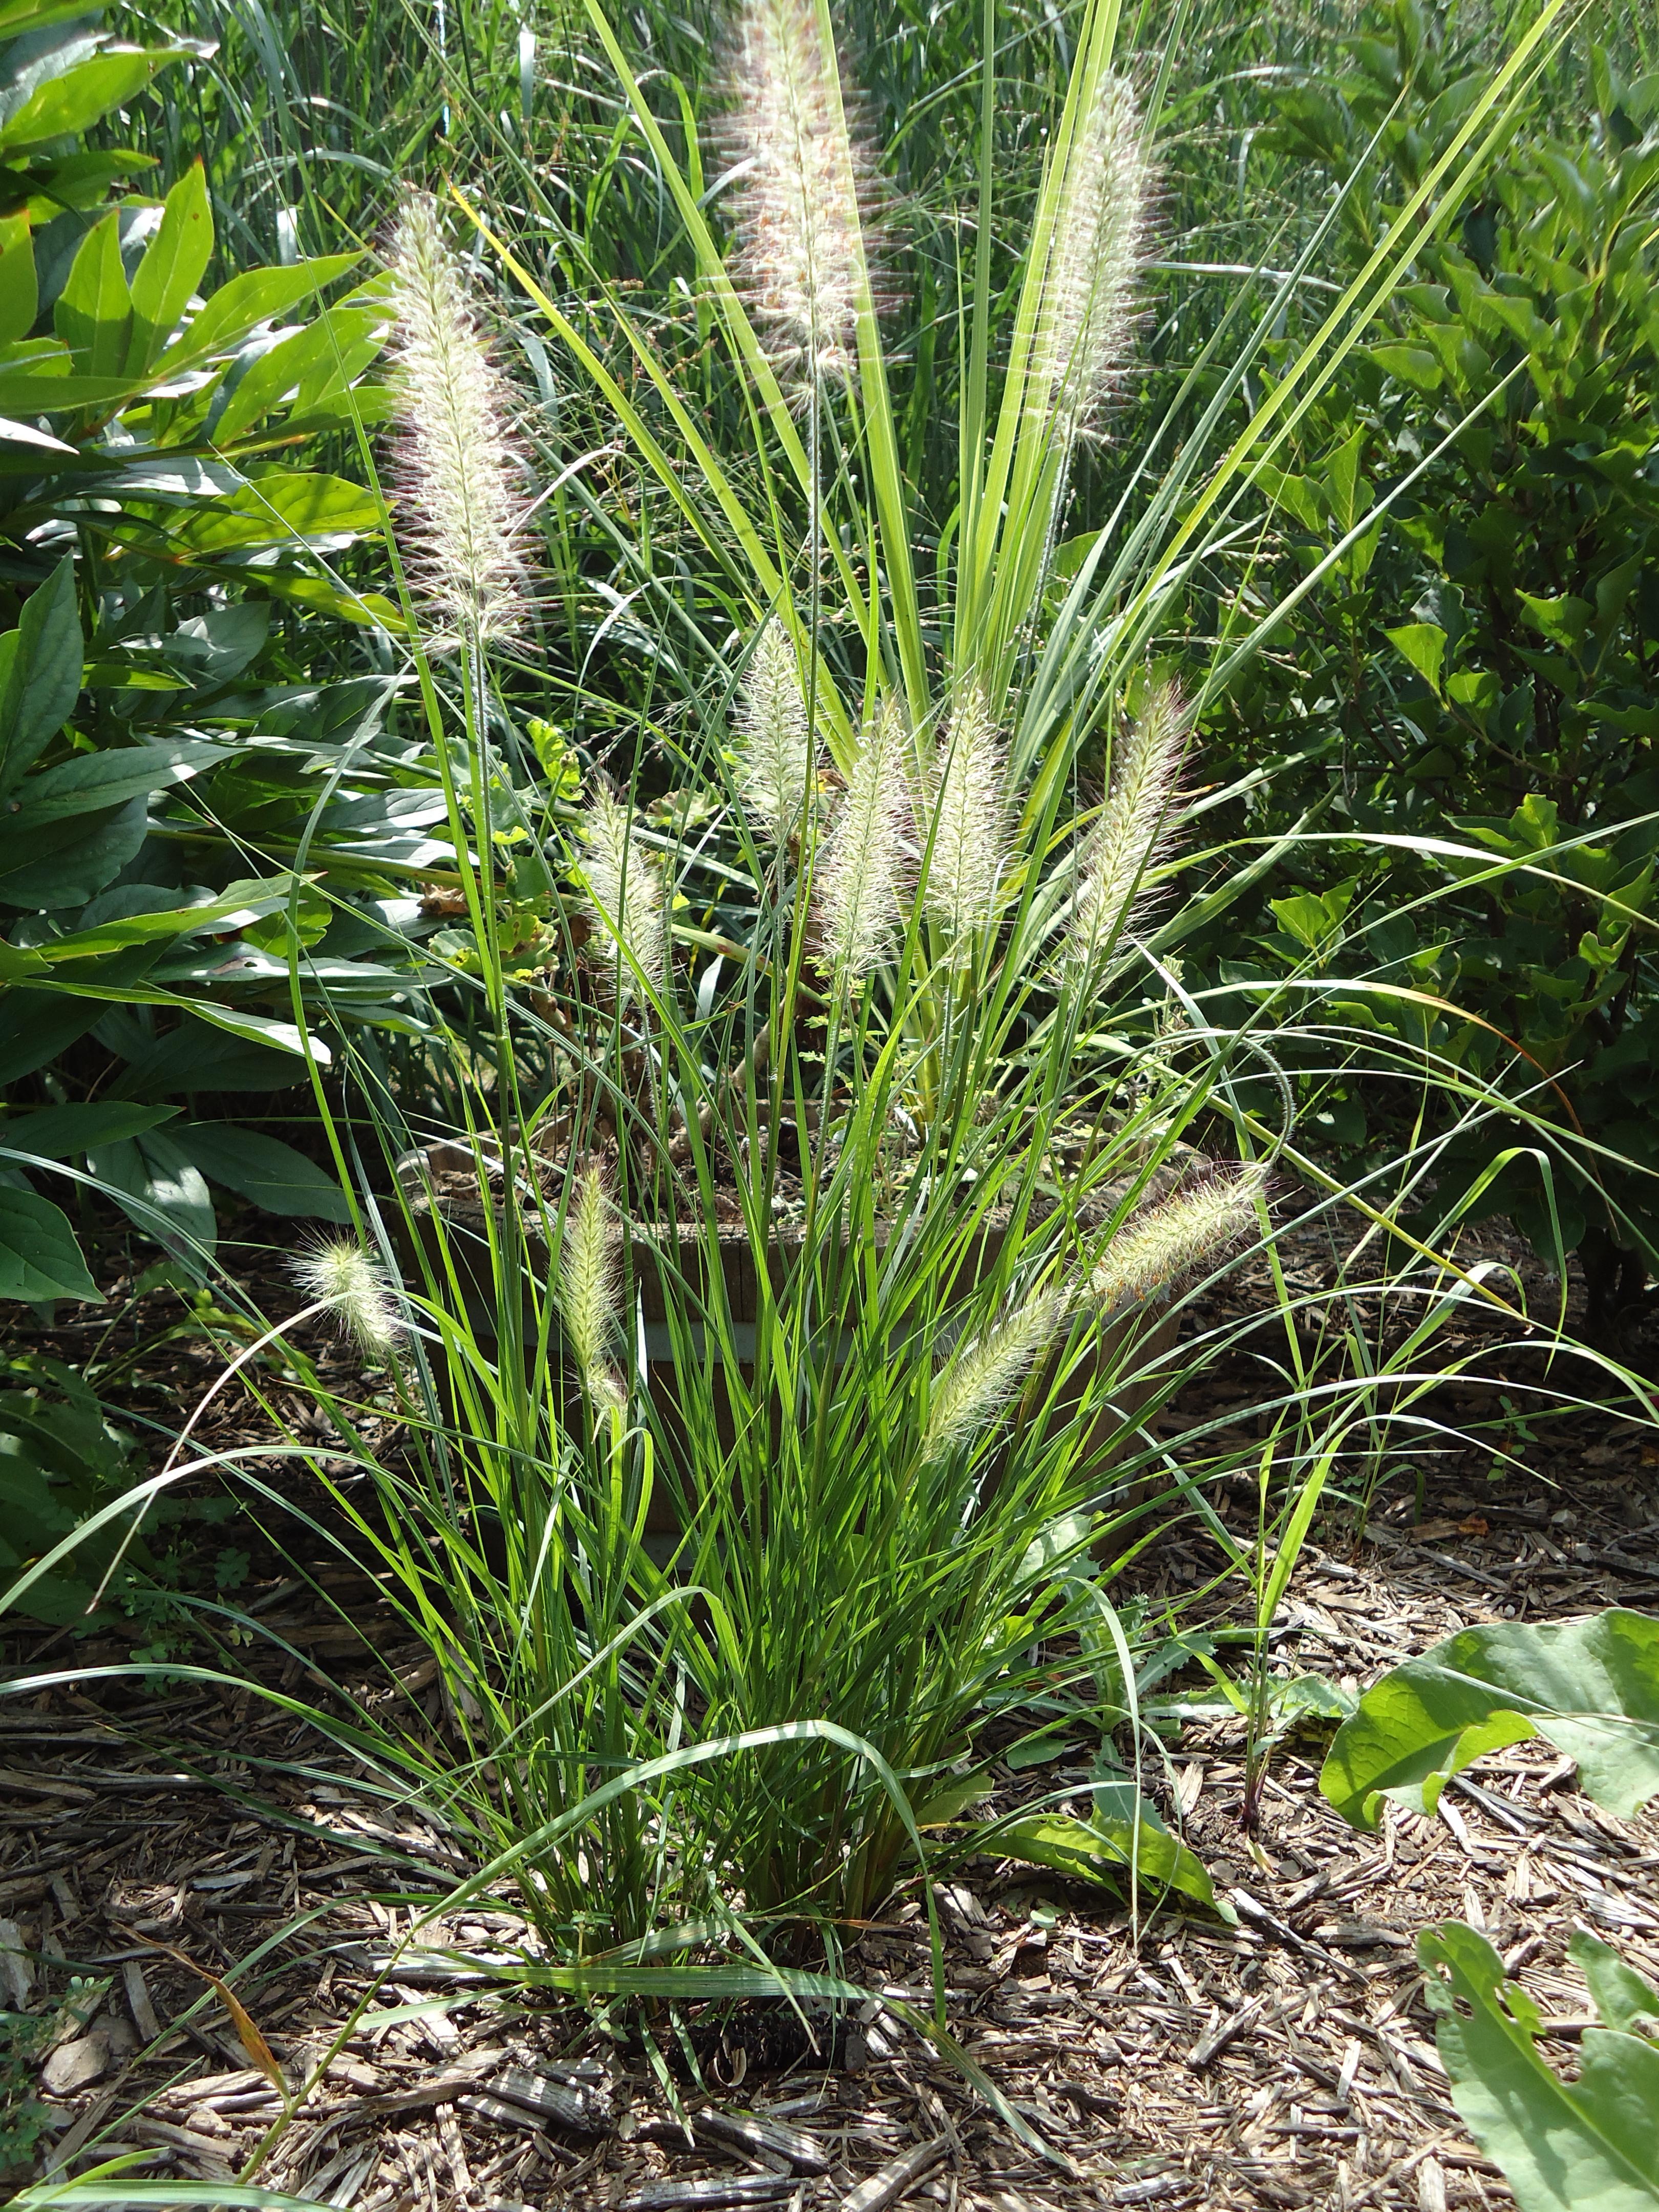 Ornamental grasses terri 39 s notebook for Low ornamental grasses